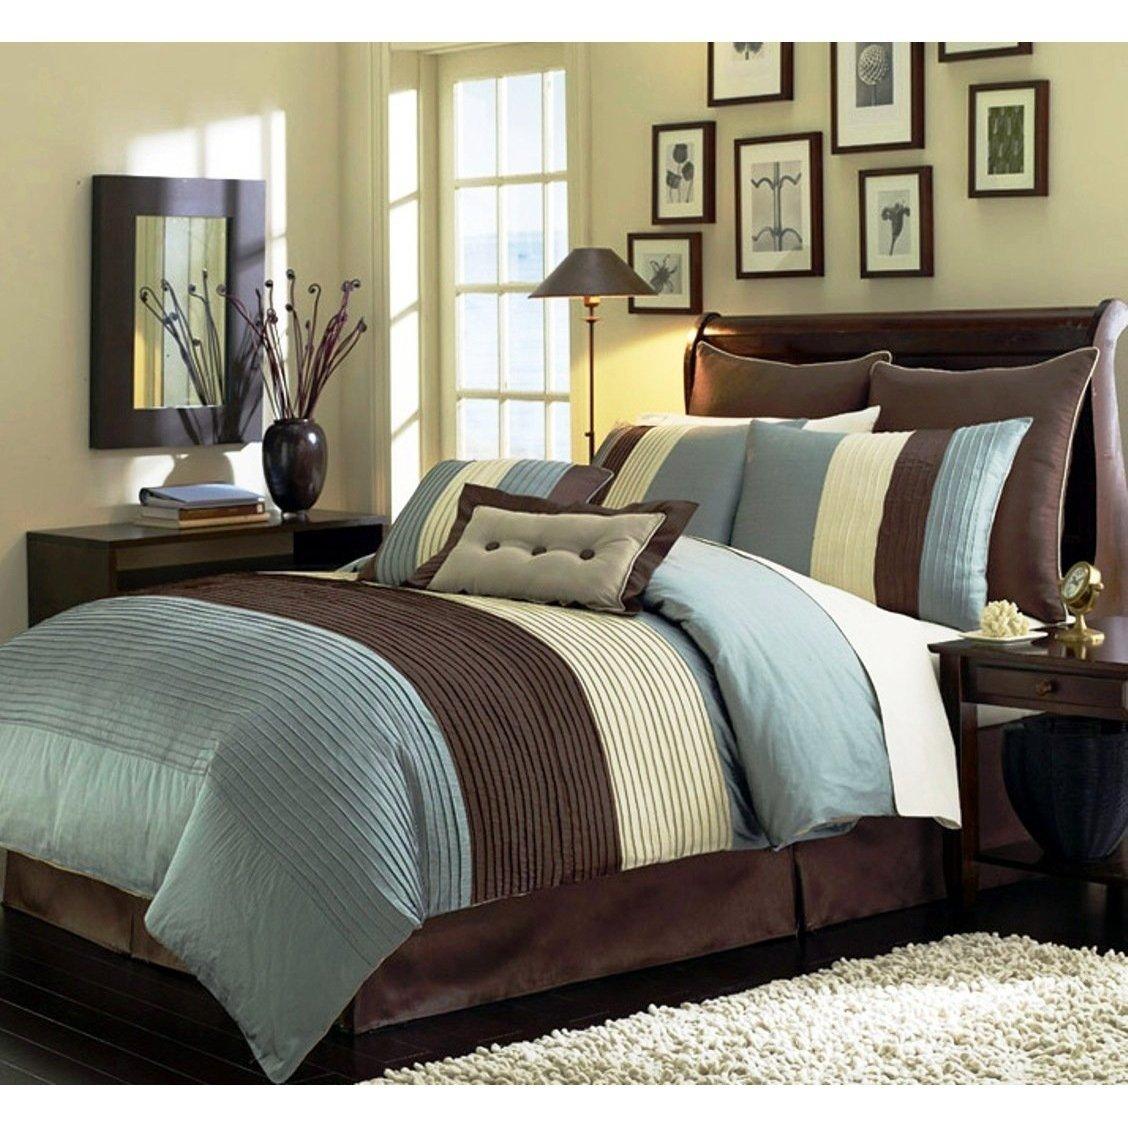 10 Elegant Blue And Brown Bedroom Ideas chocolate brown and blue bedroom ideas e280a2 bedroom ideas 2020